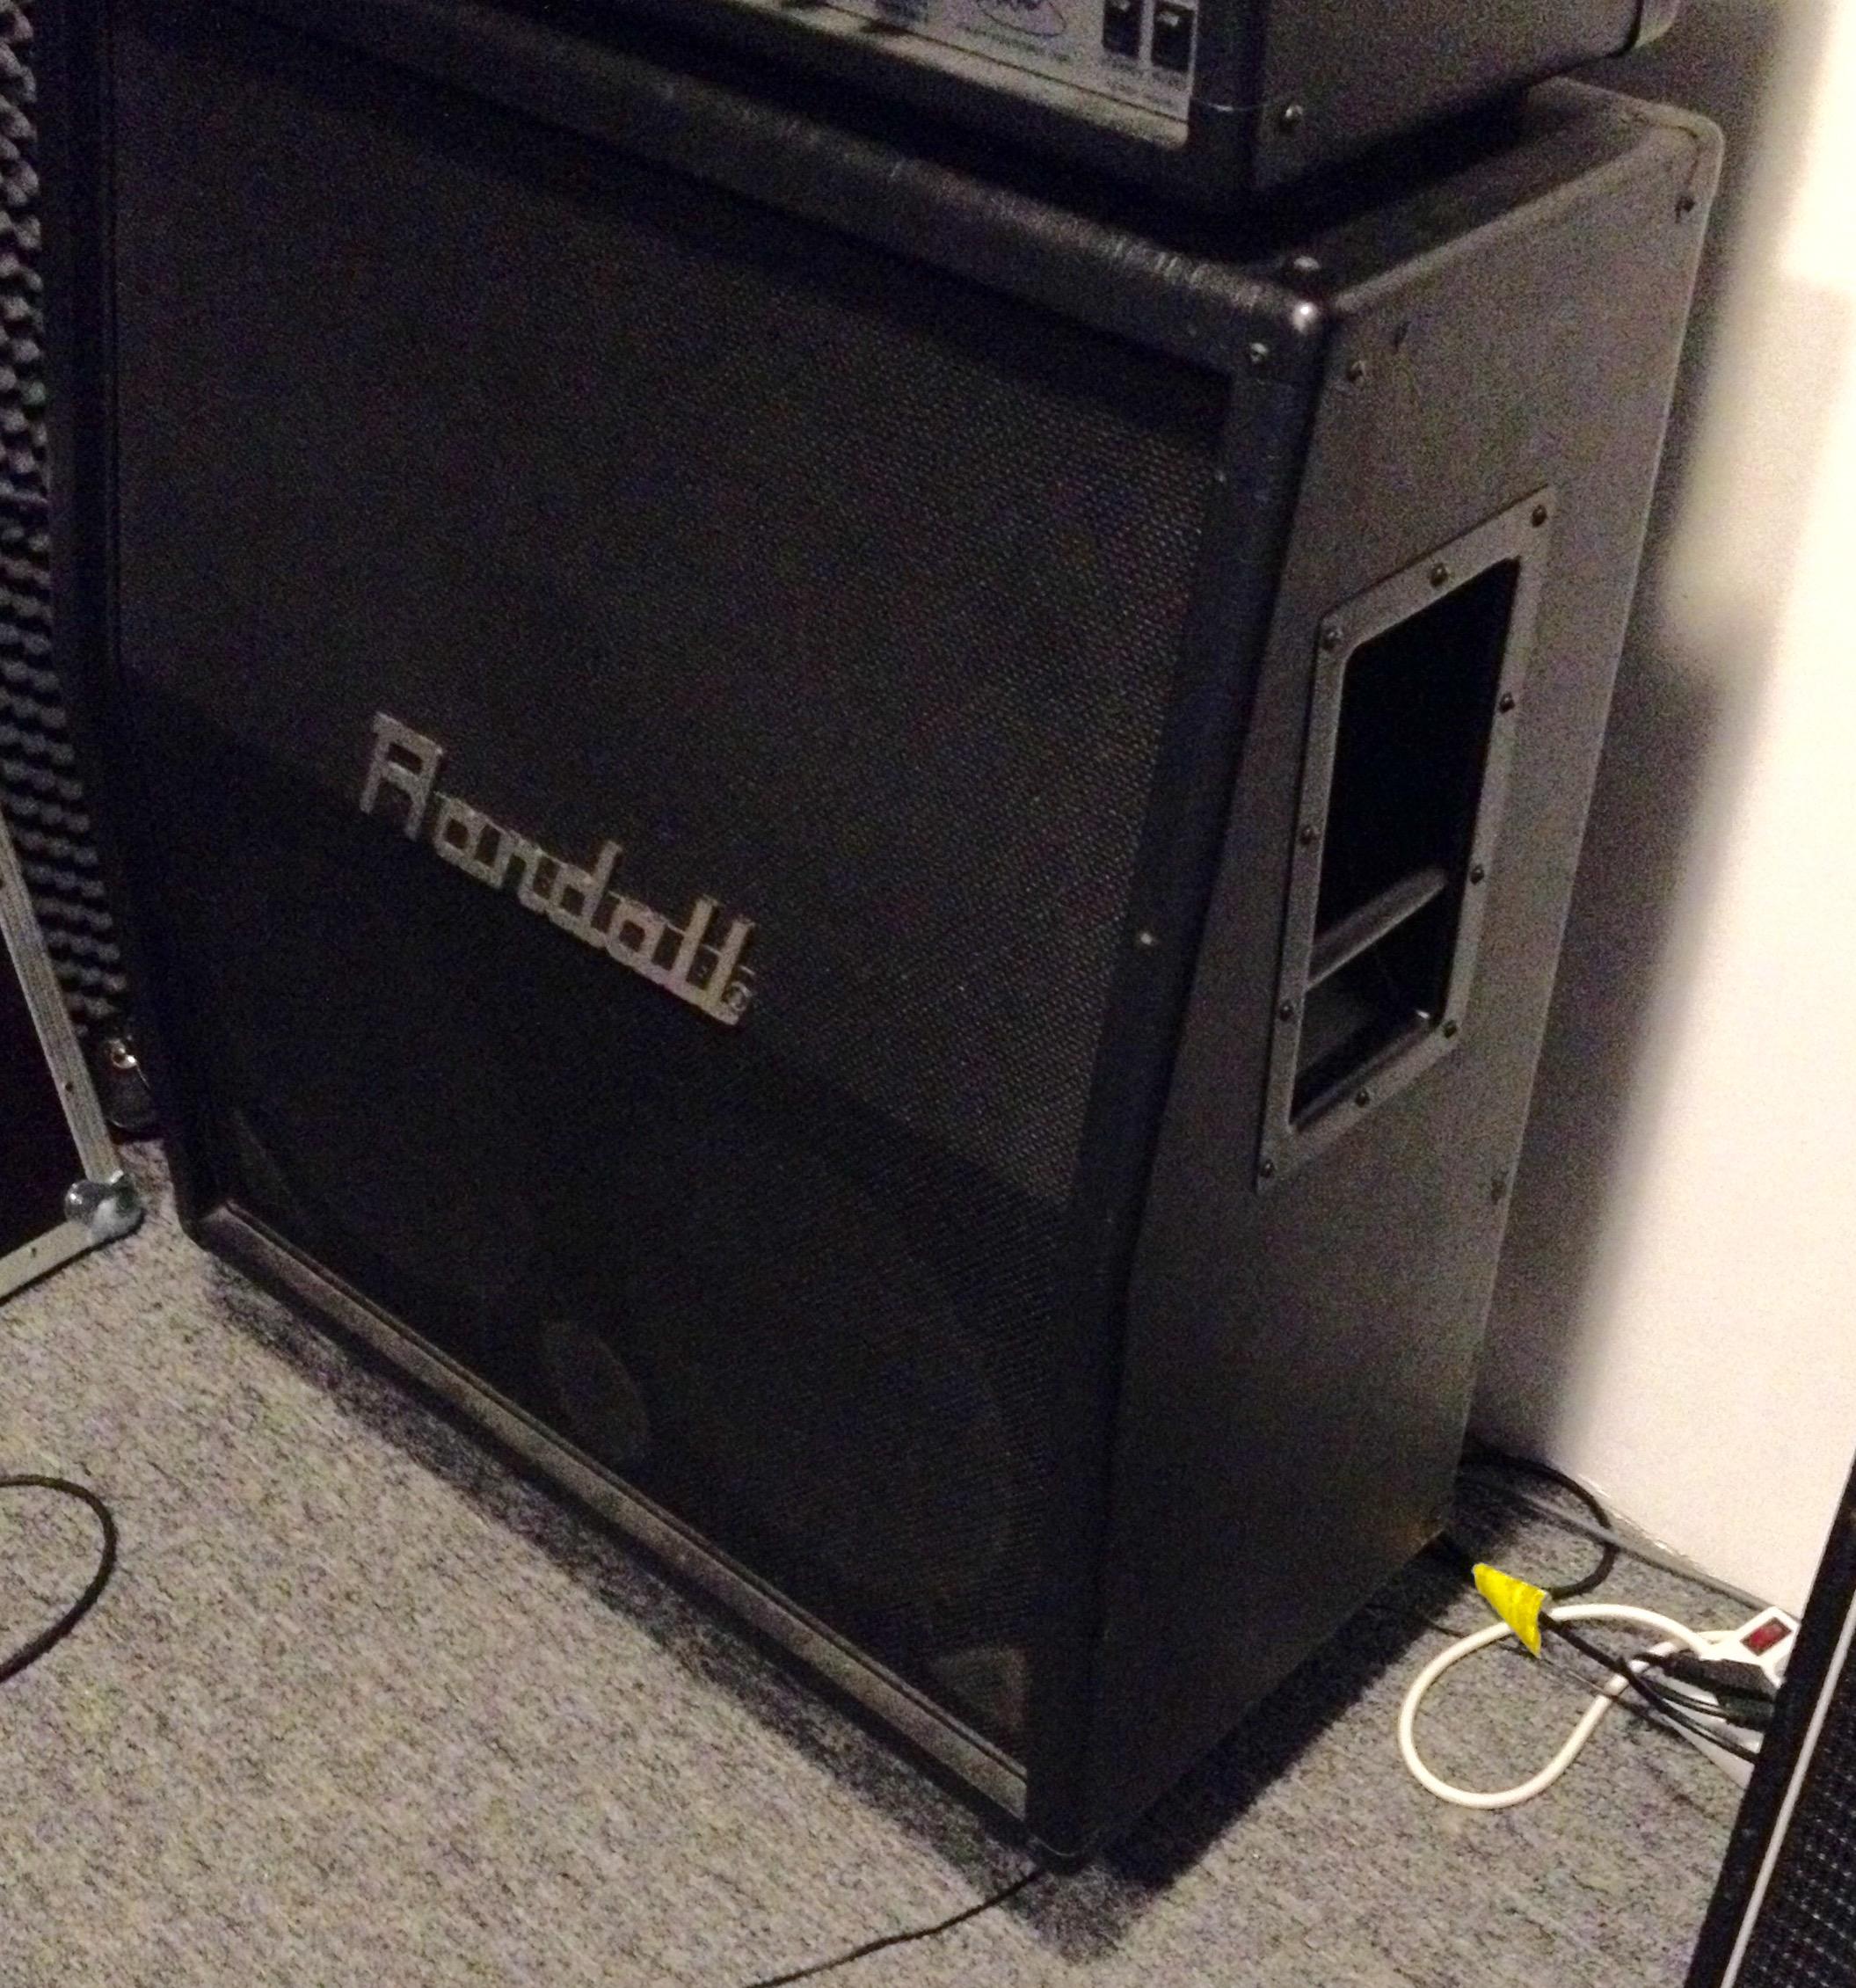 Randall 4x12 Cabinet image (#1495438) - Audiofanzine